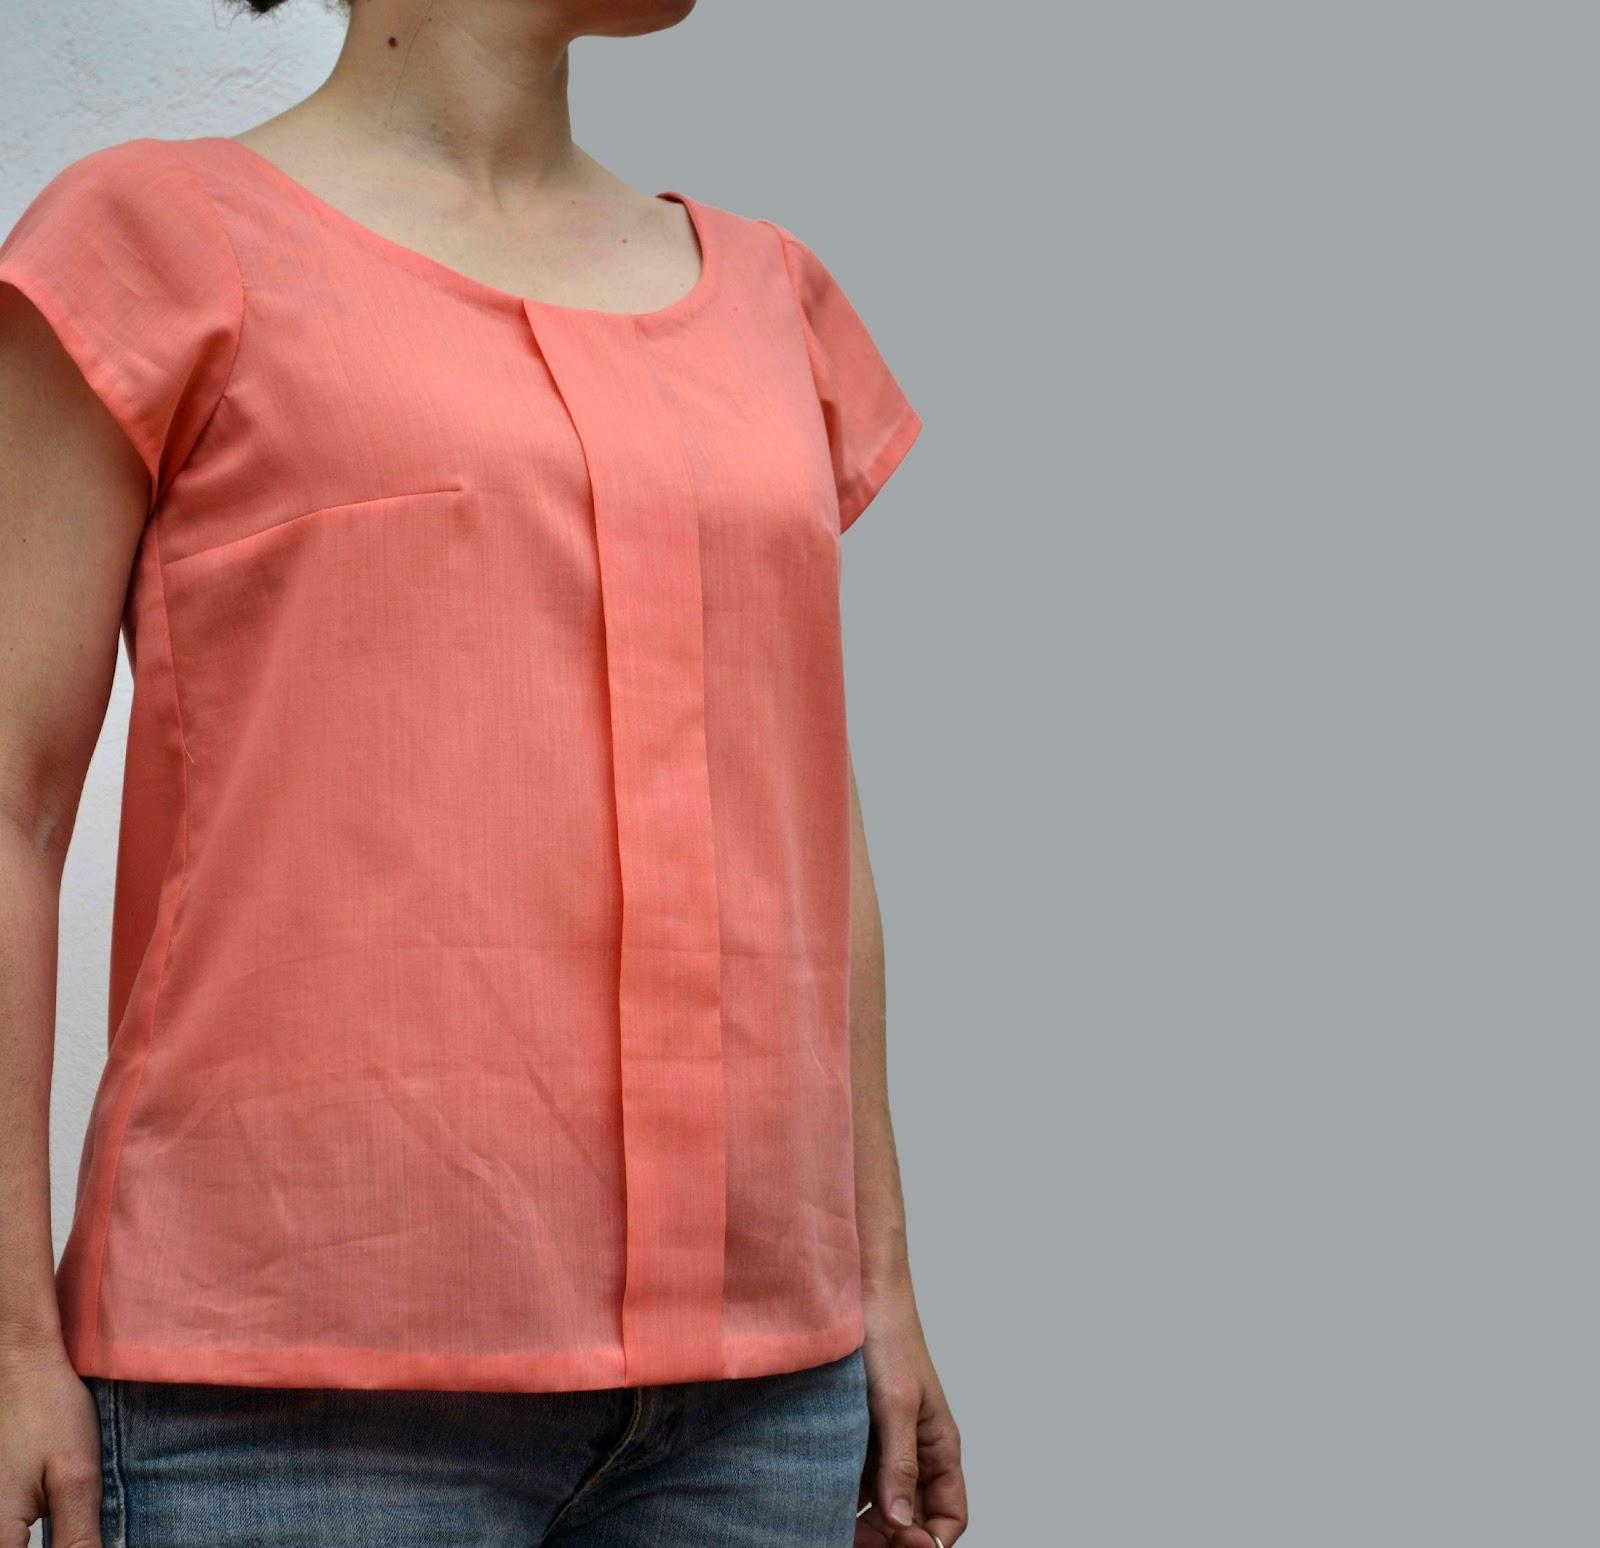 patrones para blusas de chifon   imagui